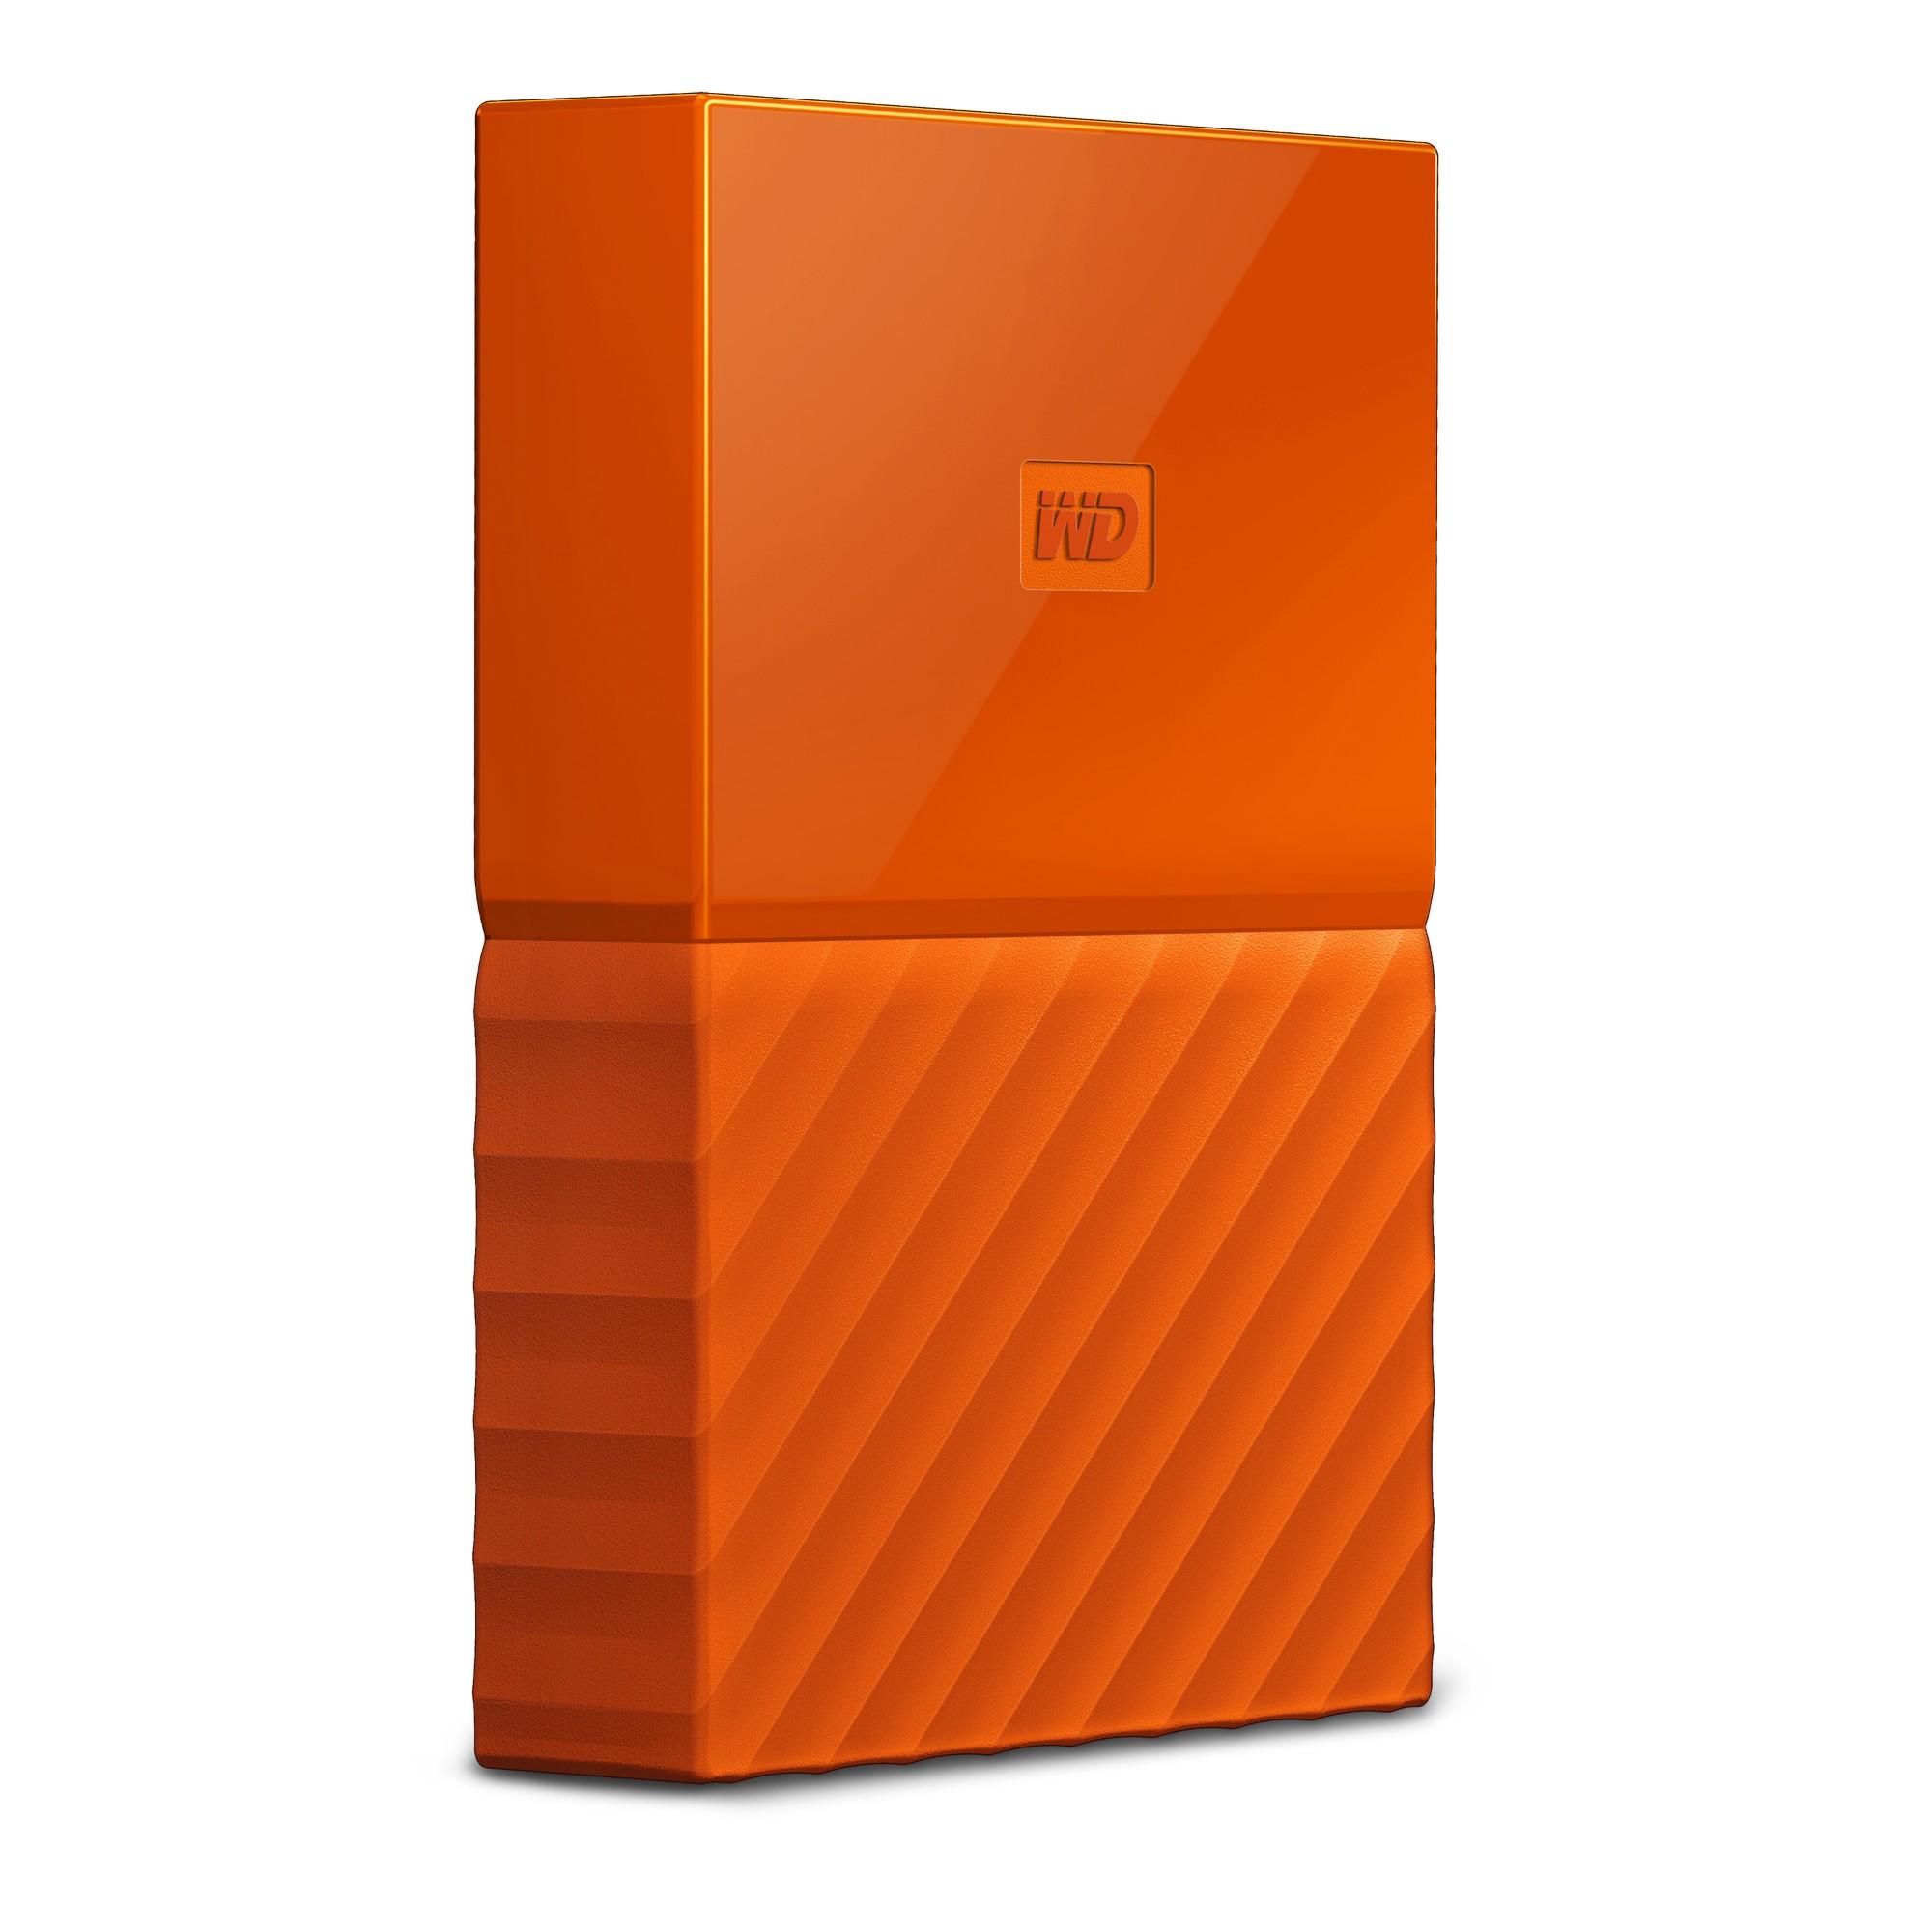 Western Digital My Passport 4000GB Orange external hard drive